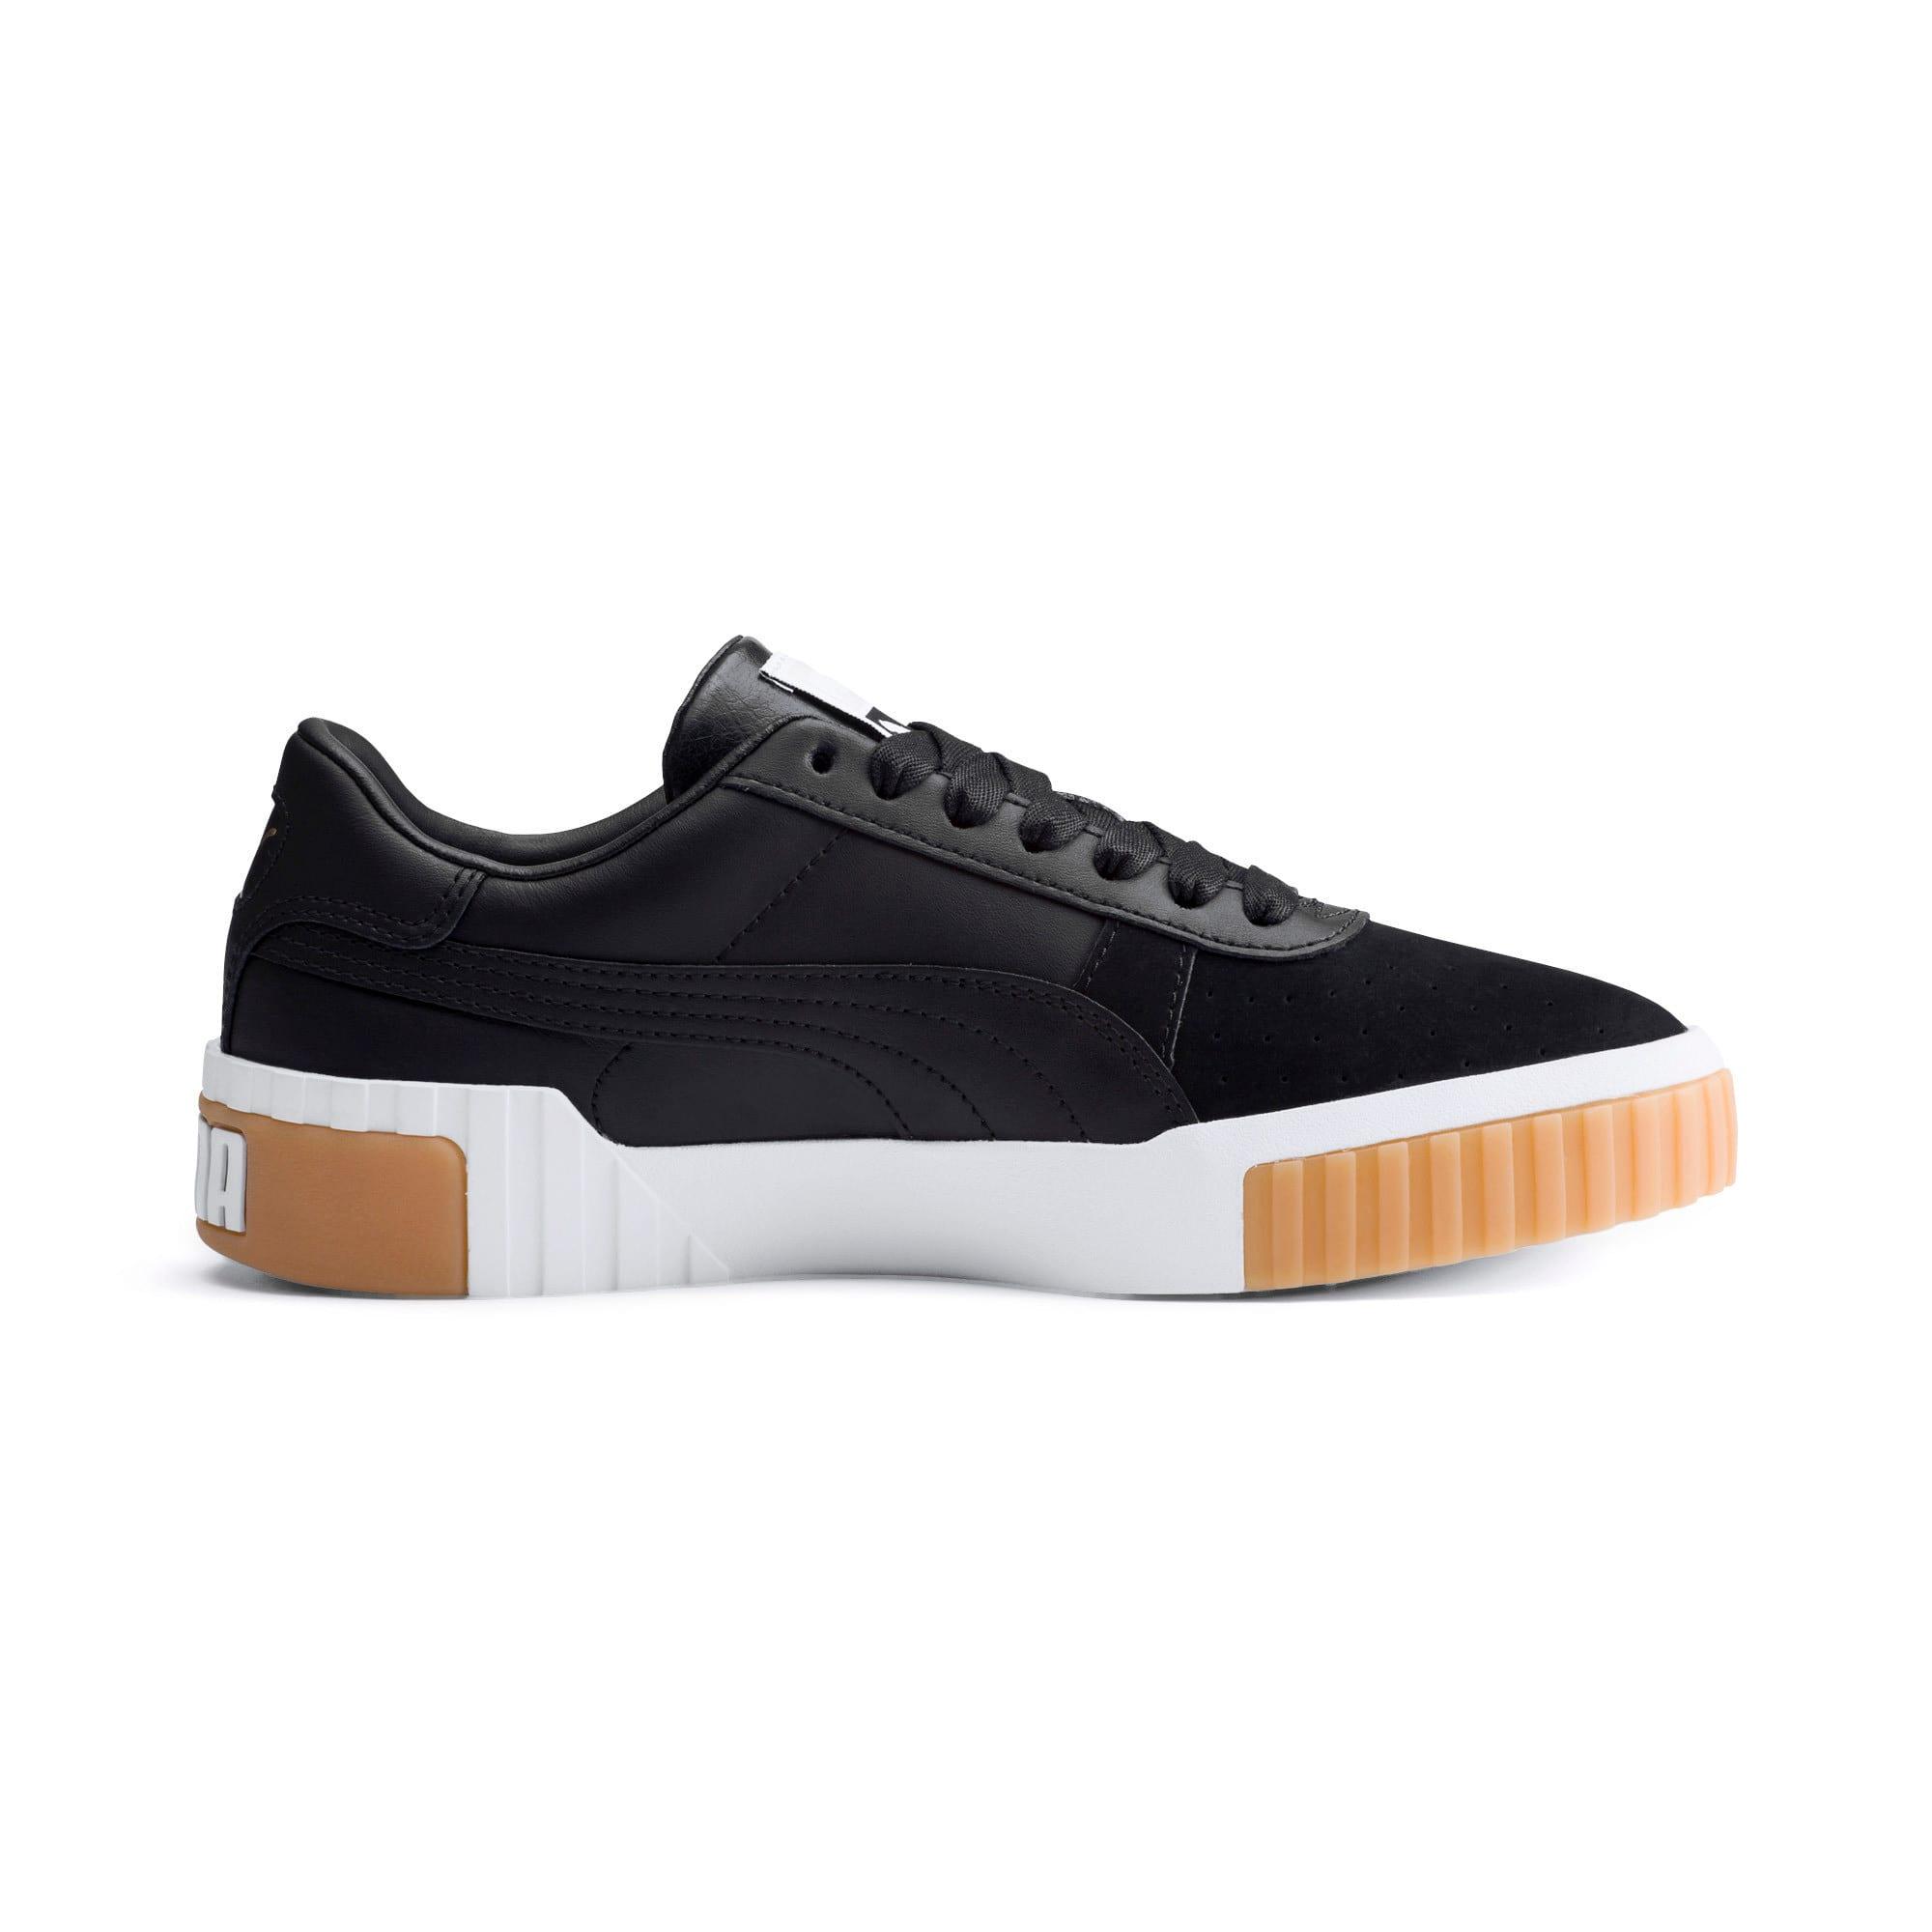 Thumbnail 5 of Cali Exotic Damen Sneaker, Puma Black-Puma Black, medium